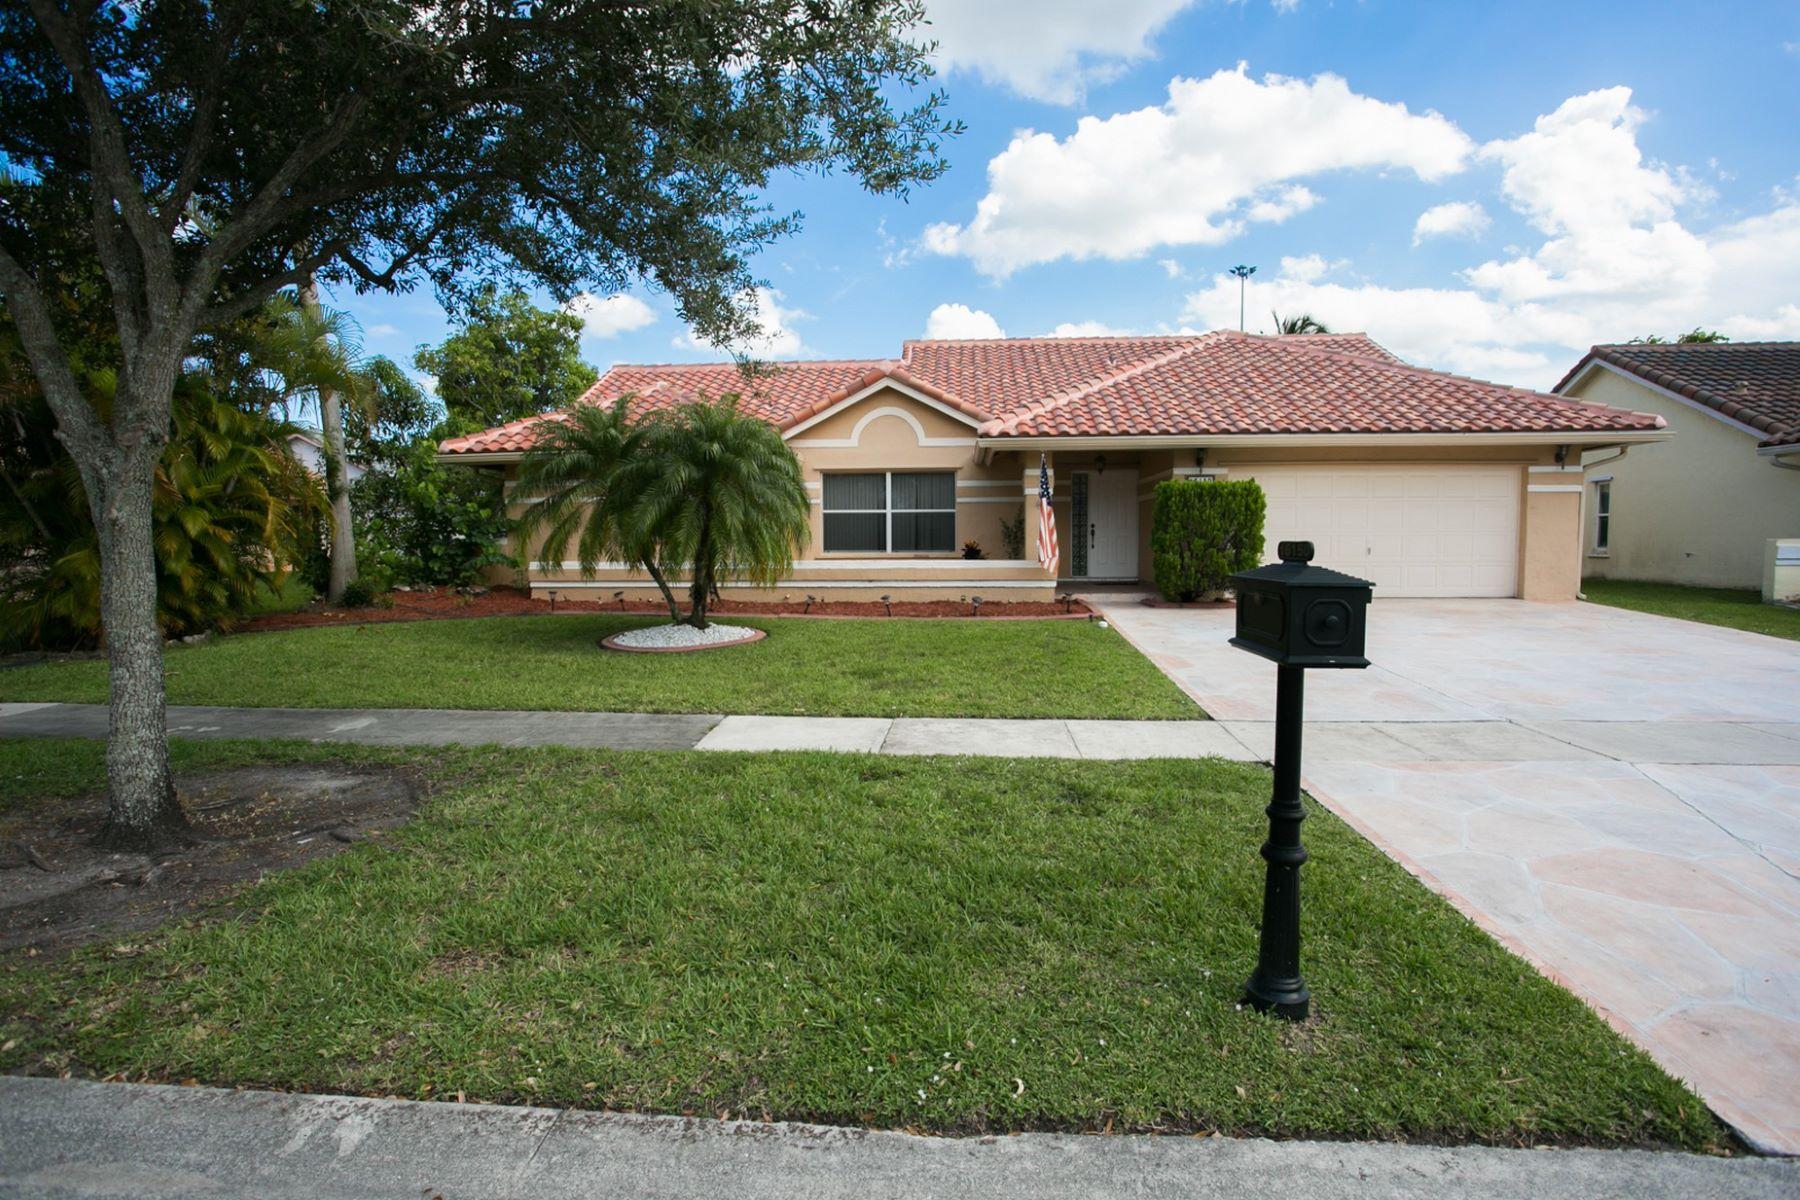 16150 Nw 1st St 16150 Nw 1st St Pembroke Pines, Florida 33028 Stati Uniti